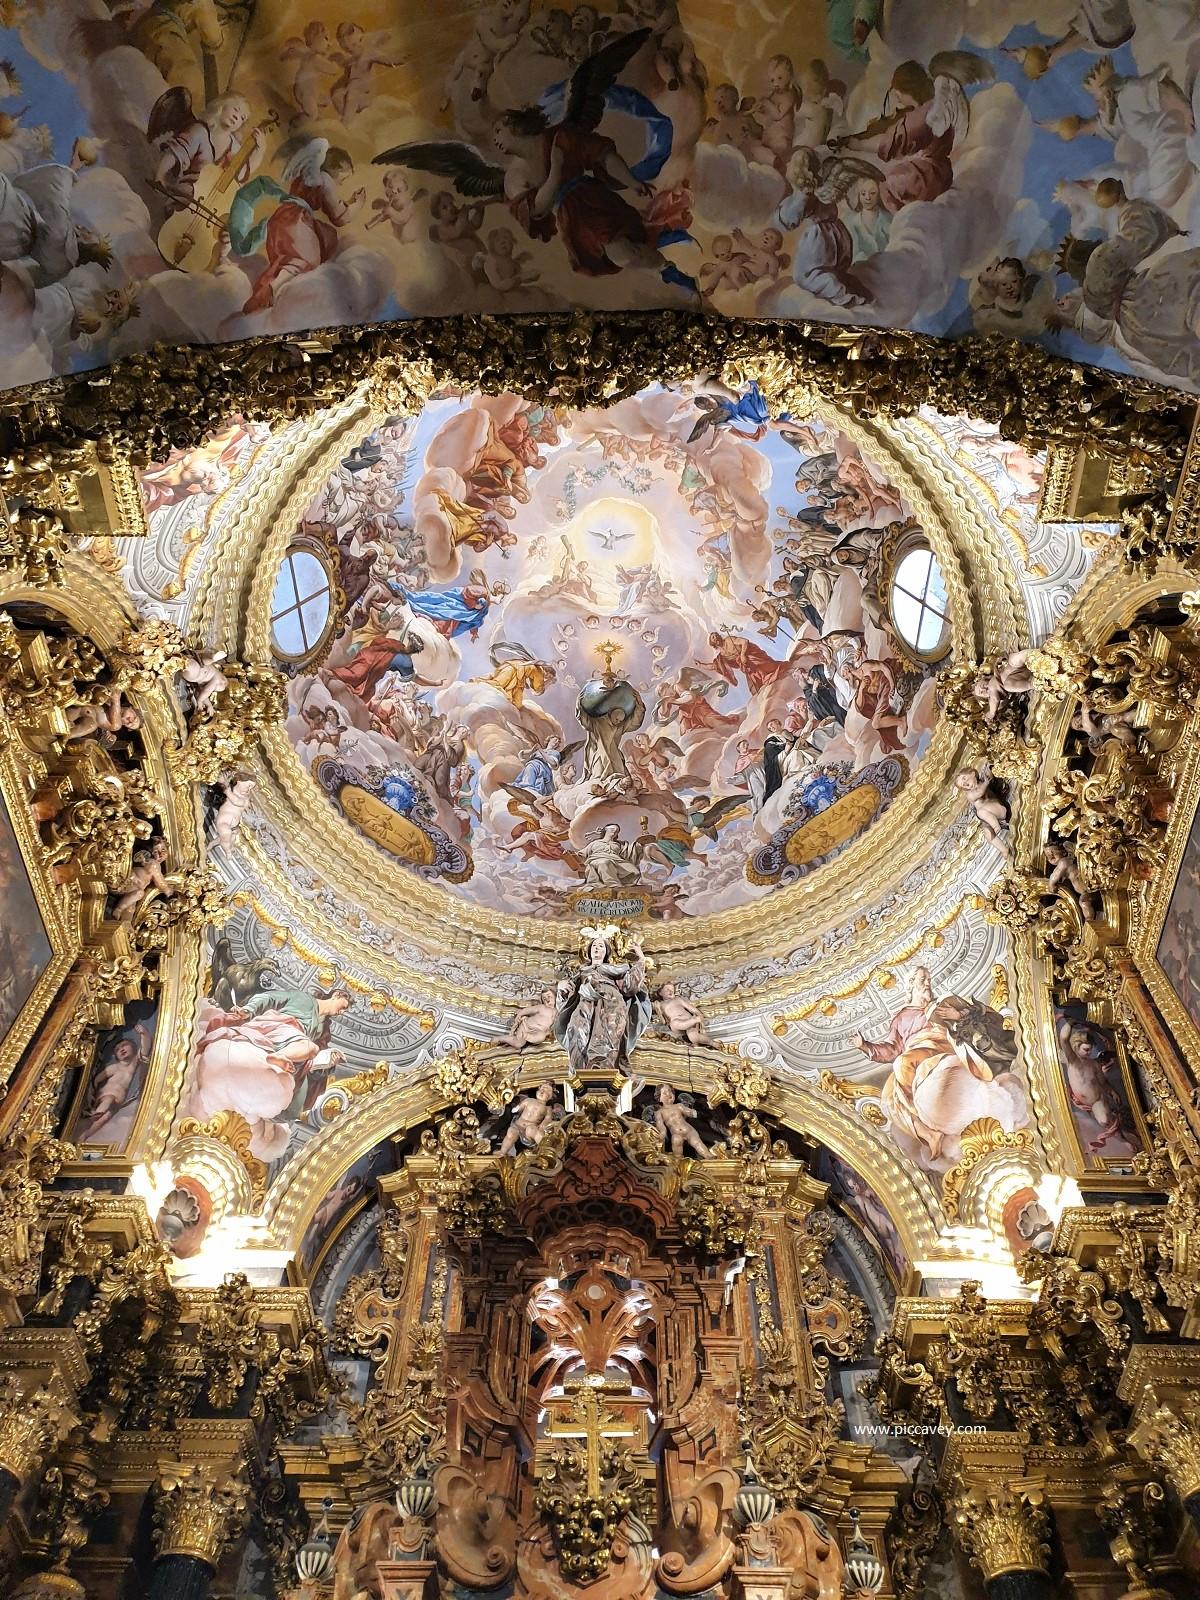 Cartuja Monastery - A Jewel of Spanish Baroque in Granada